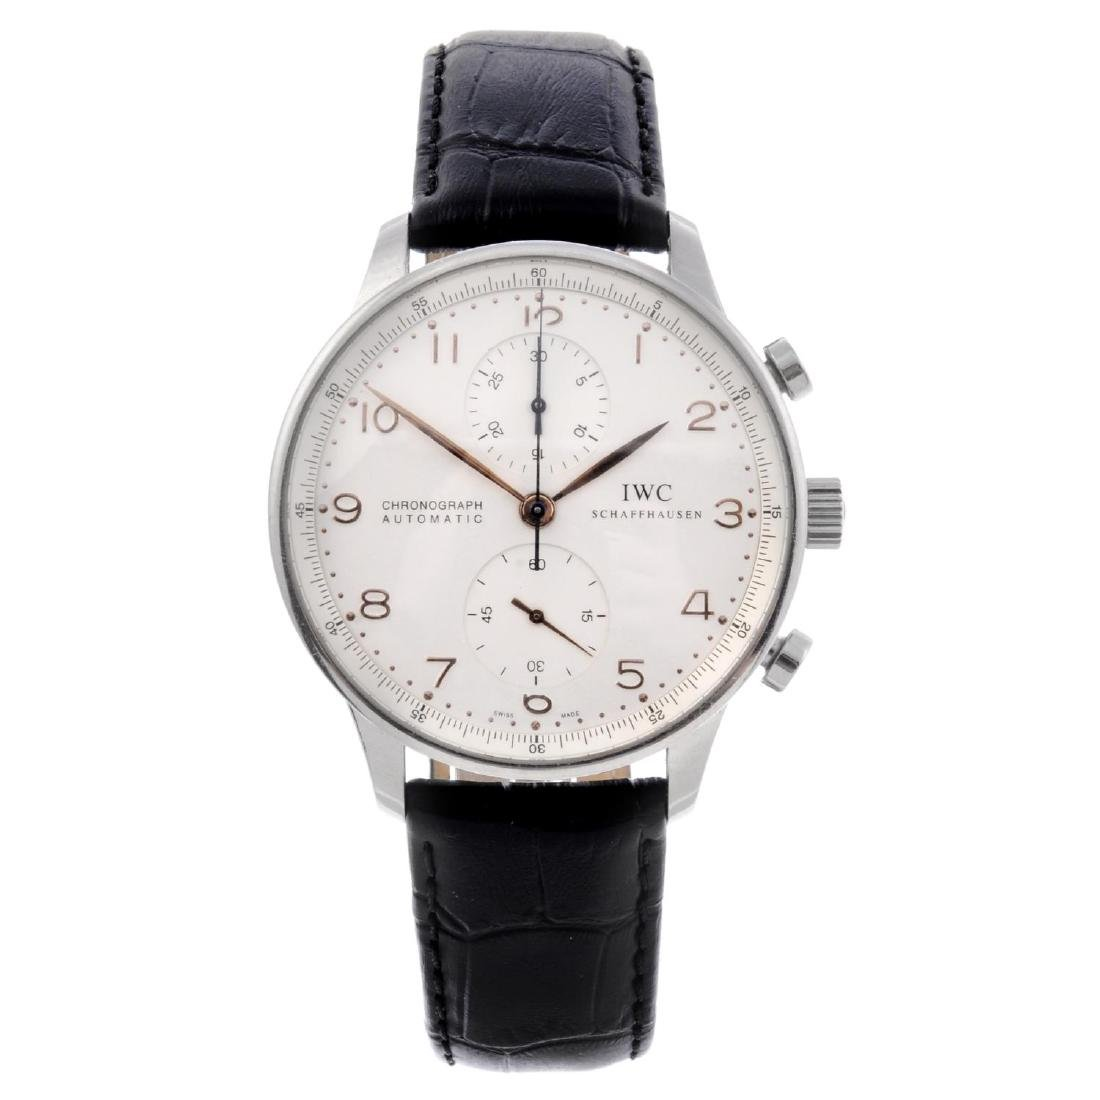 IWC - a gentleman's Portuguese chronograph wrist watch.